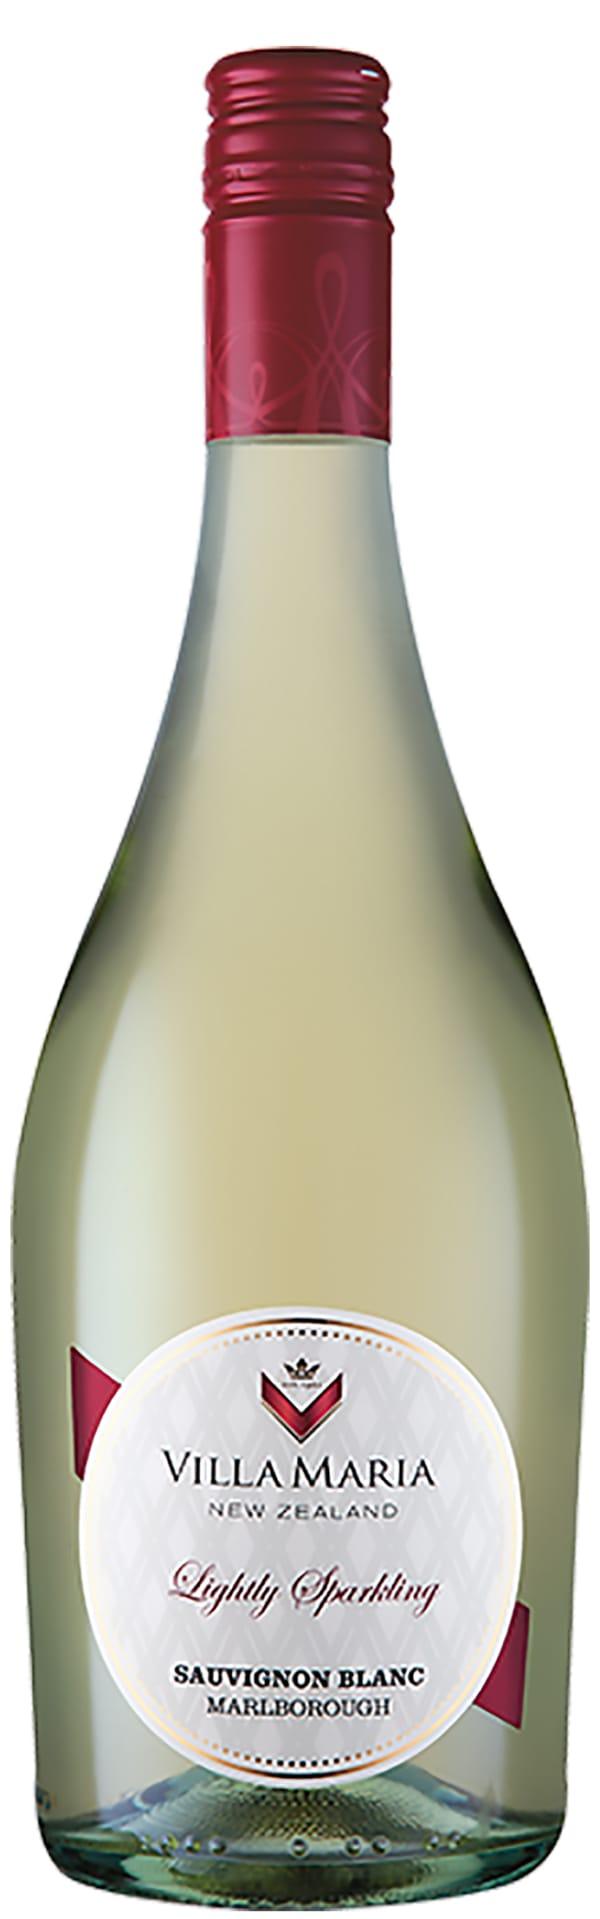 Villa Maria Lightly Sparkling Sauvignon Blanc 2019